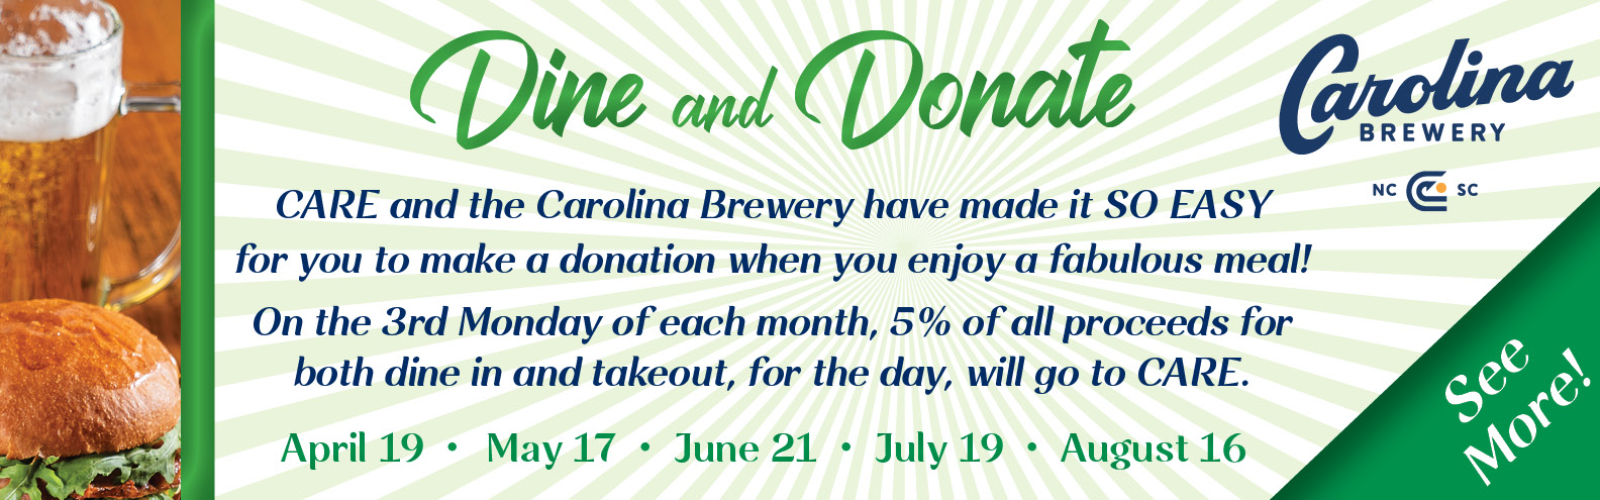 CB Dine and Donate SLIDER